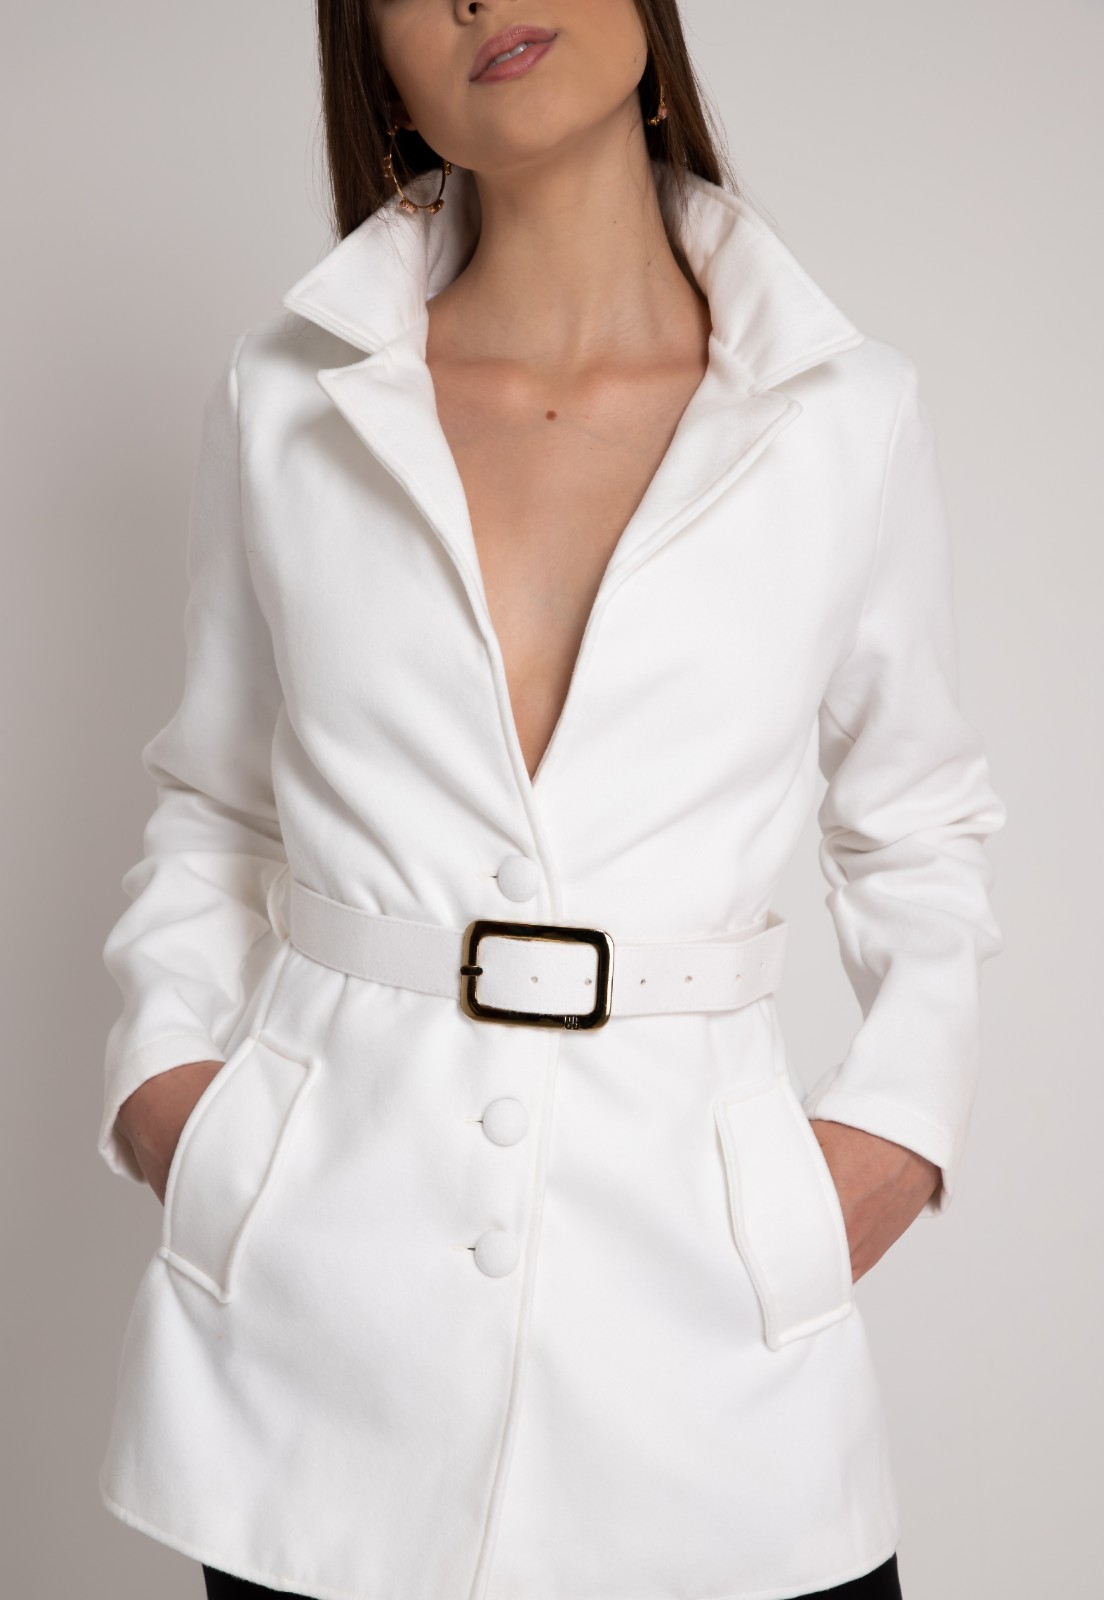 Casaco feminino branco